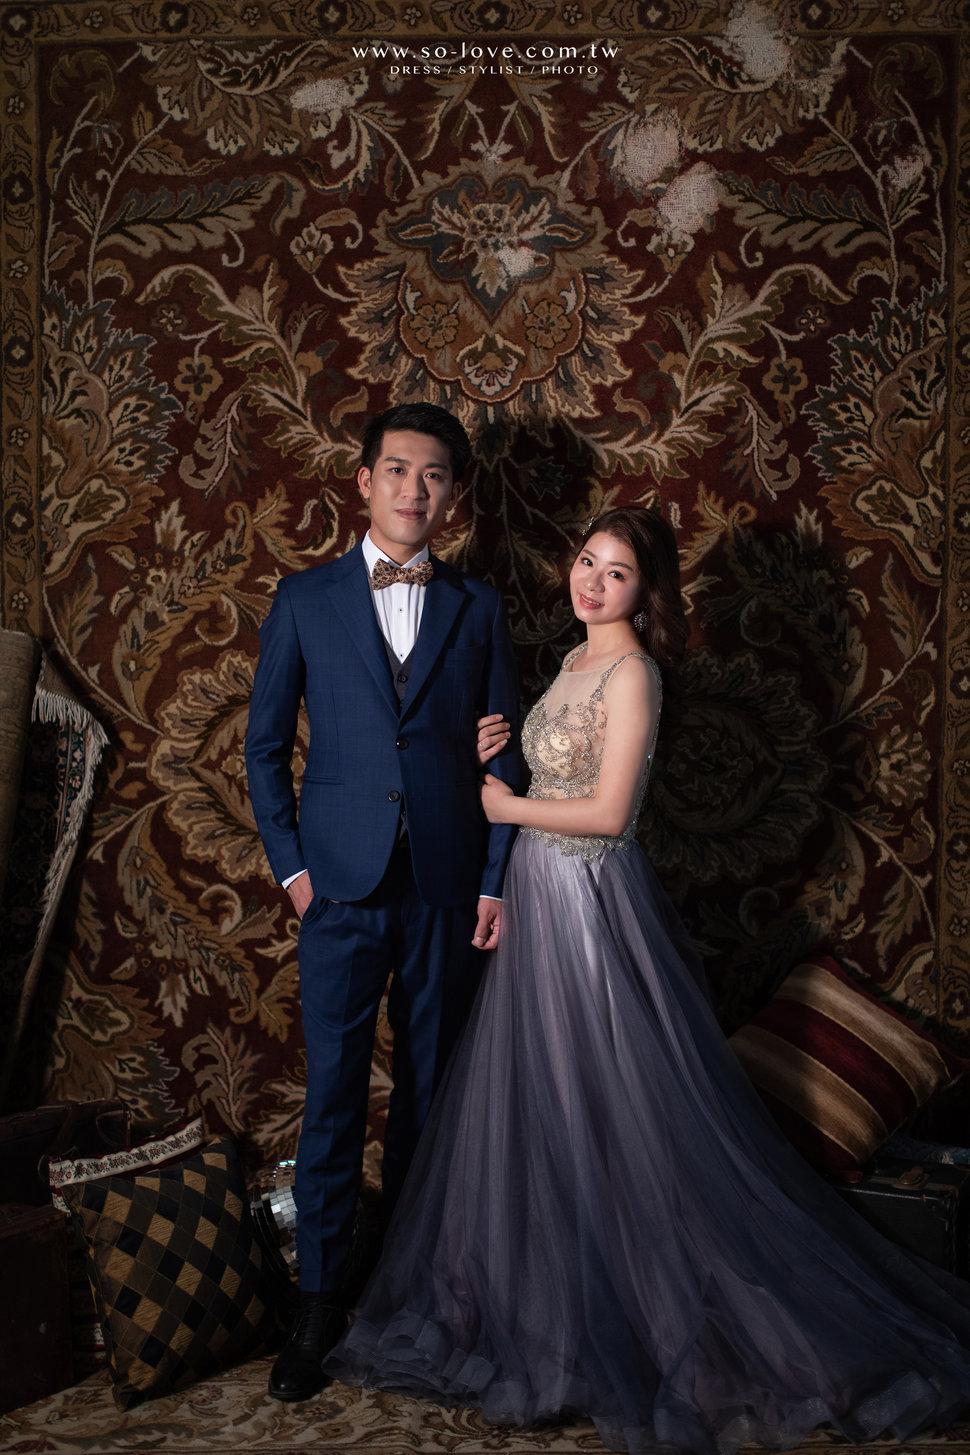 RYAN8202 - So.Love Wedding 樂樂蕾絲《結婚吧》